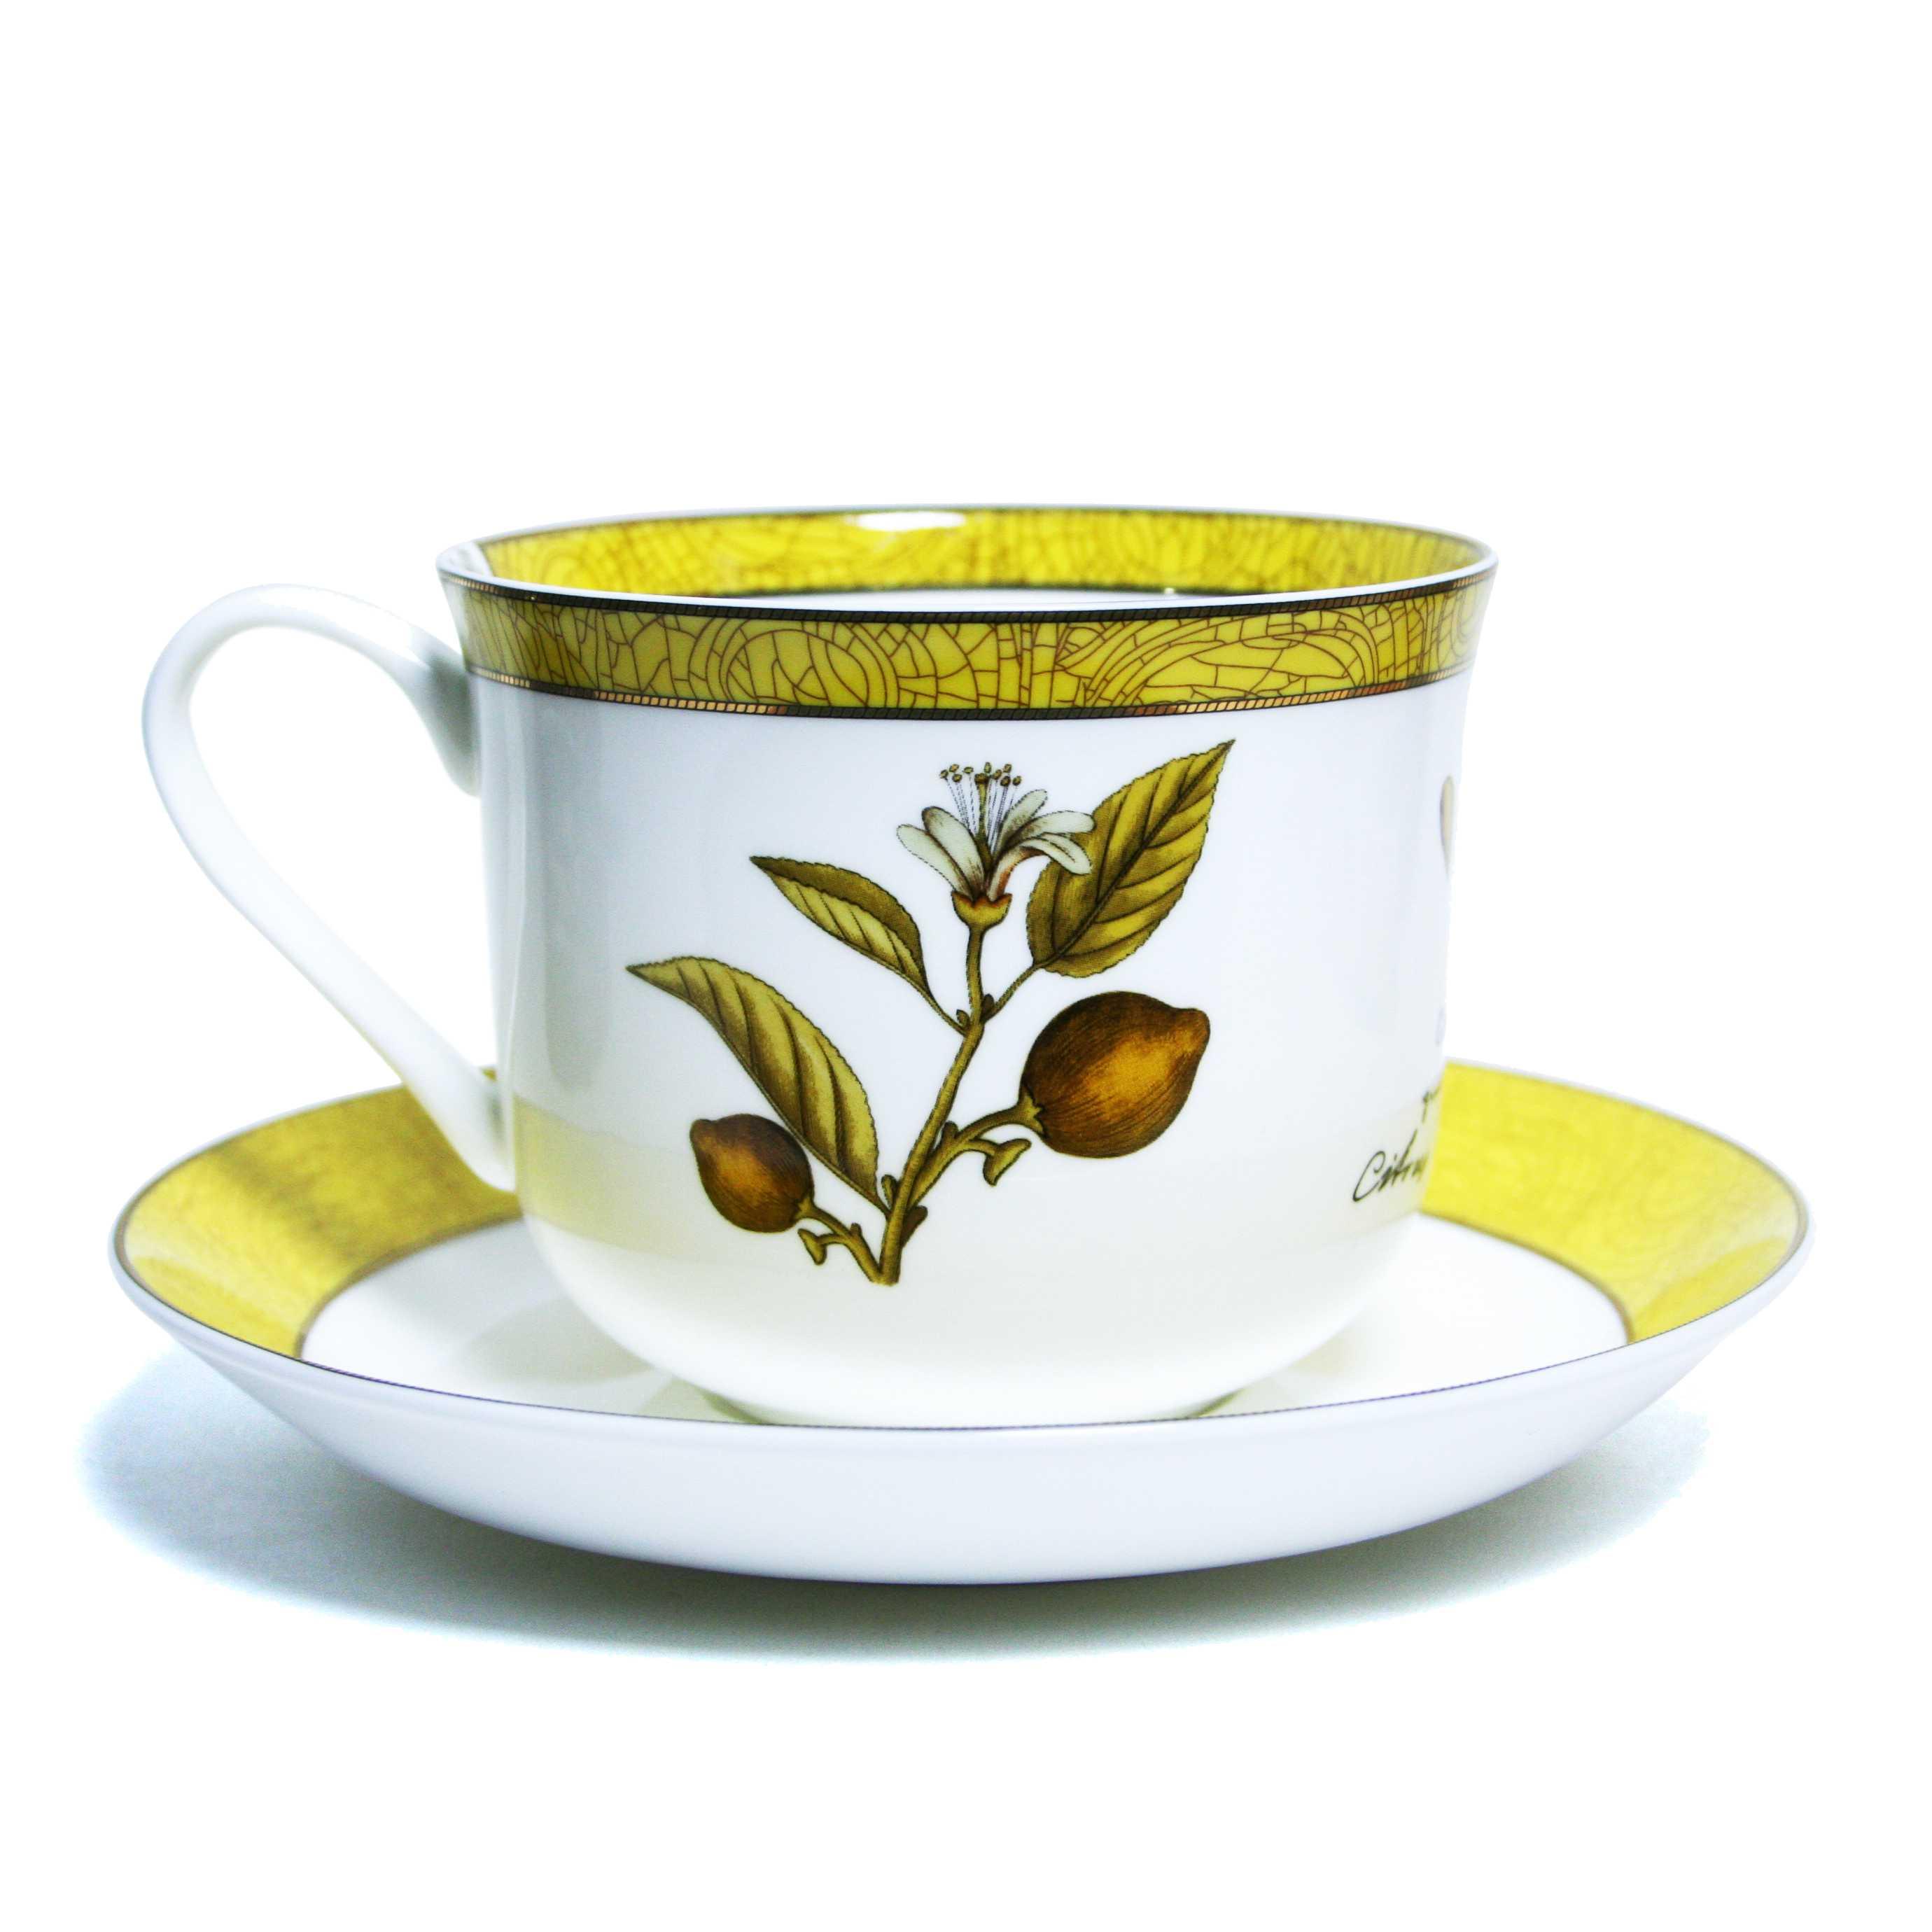 Фото - Пара чайная PrioritY Дыхание Прованса Лимон 480 мл пара чайная priority дыхание прованса вишня 480 мл